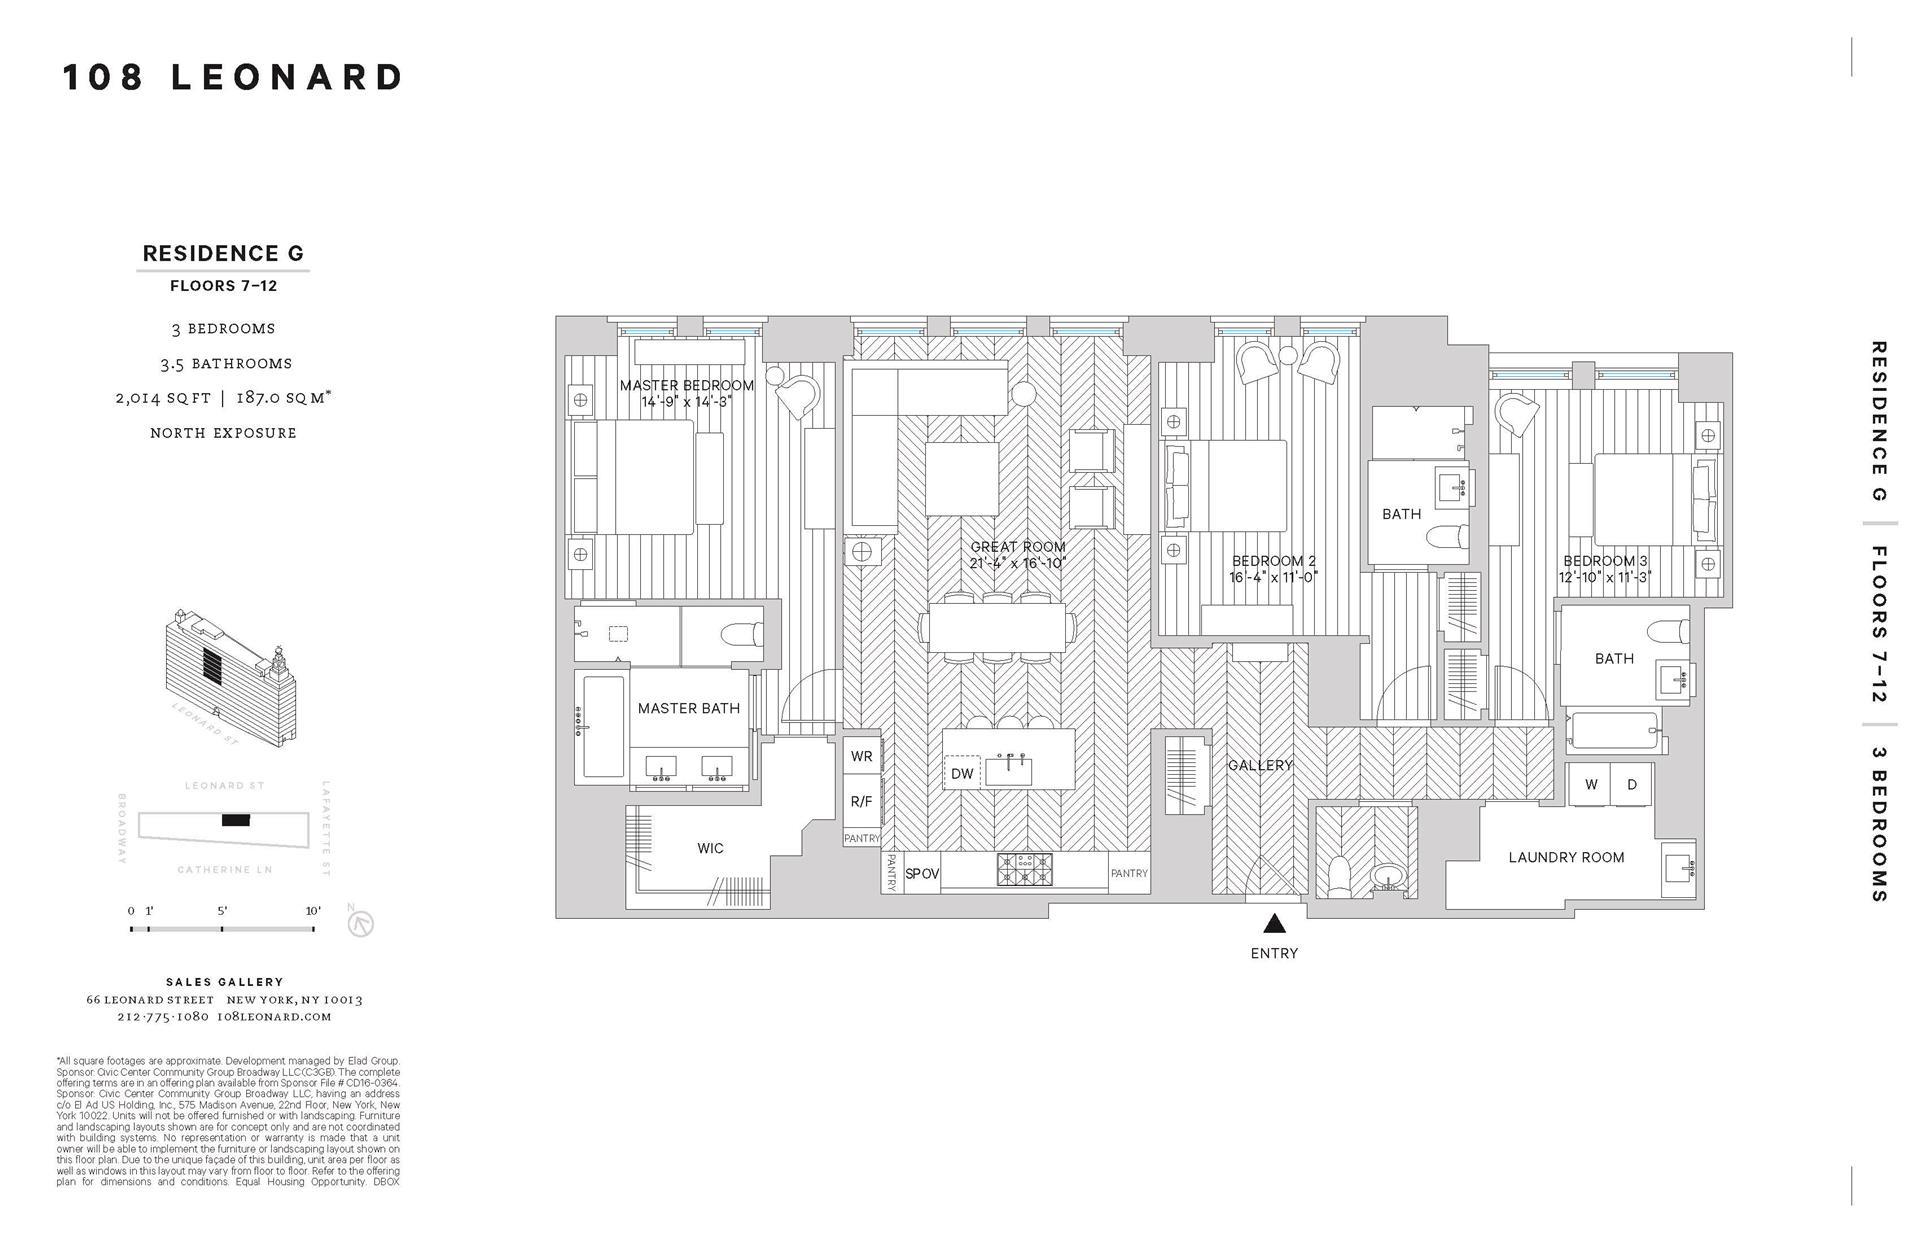 Floor plan of 108 Leonard St, 7G - TriBeCa, New York